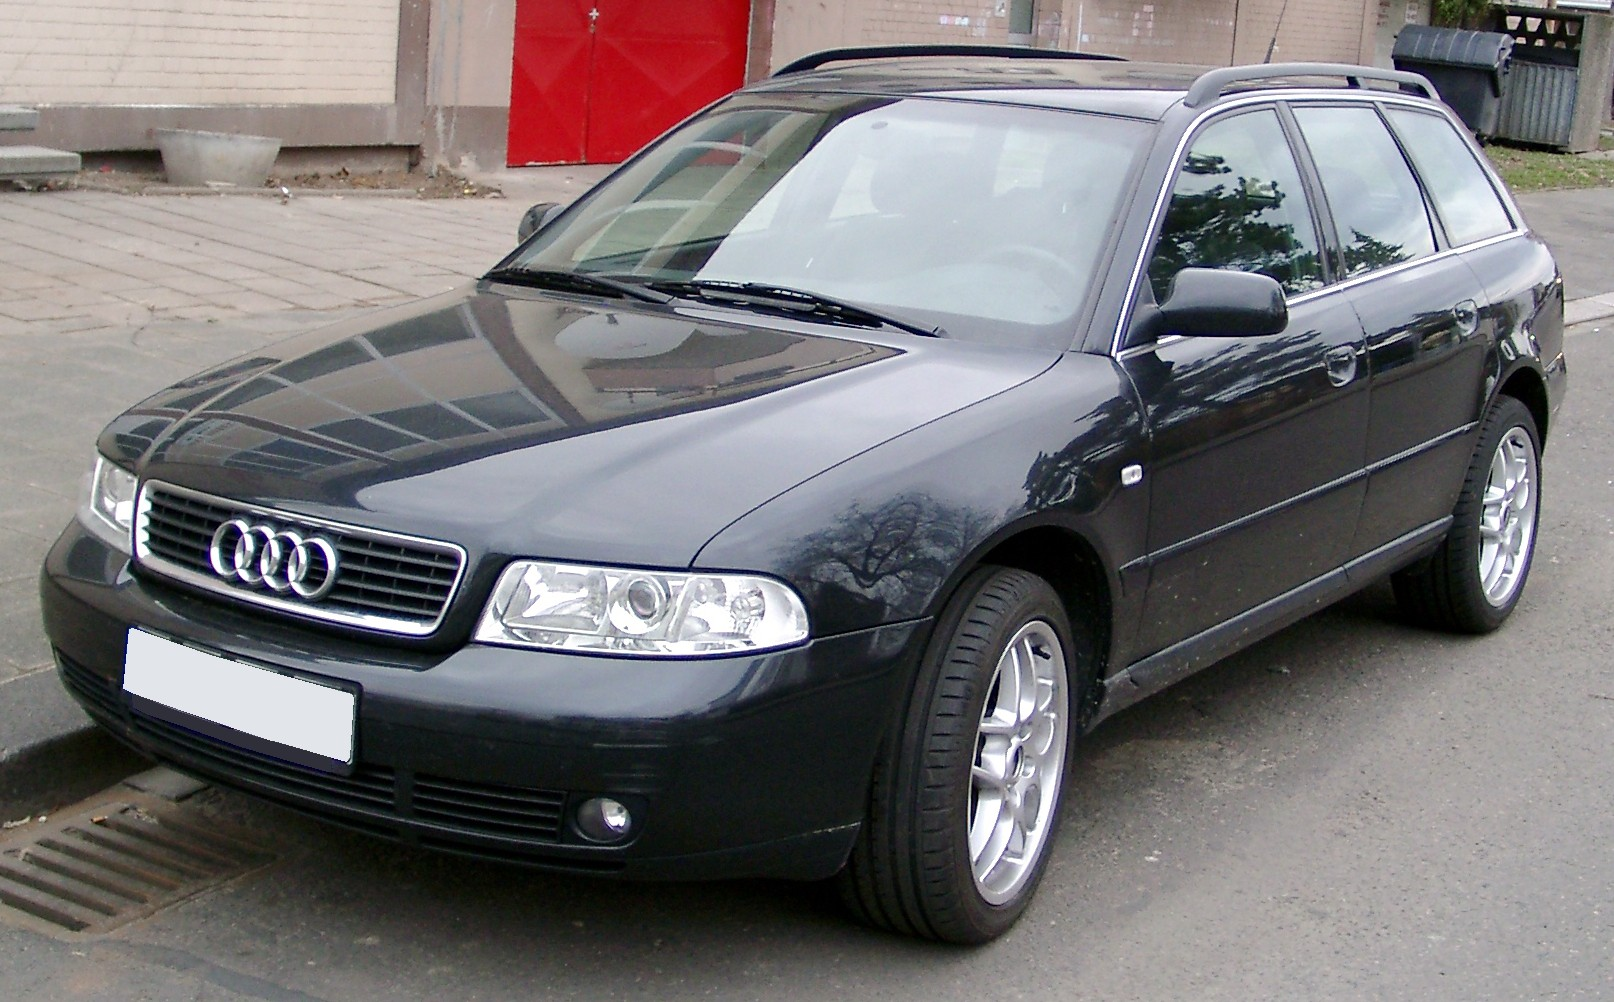 File Audi A4 B5 Avant Front 20080121 Jpg Wikimedia Commons